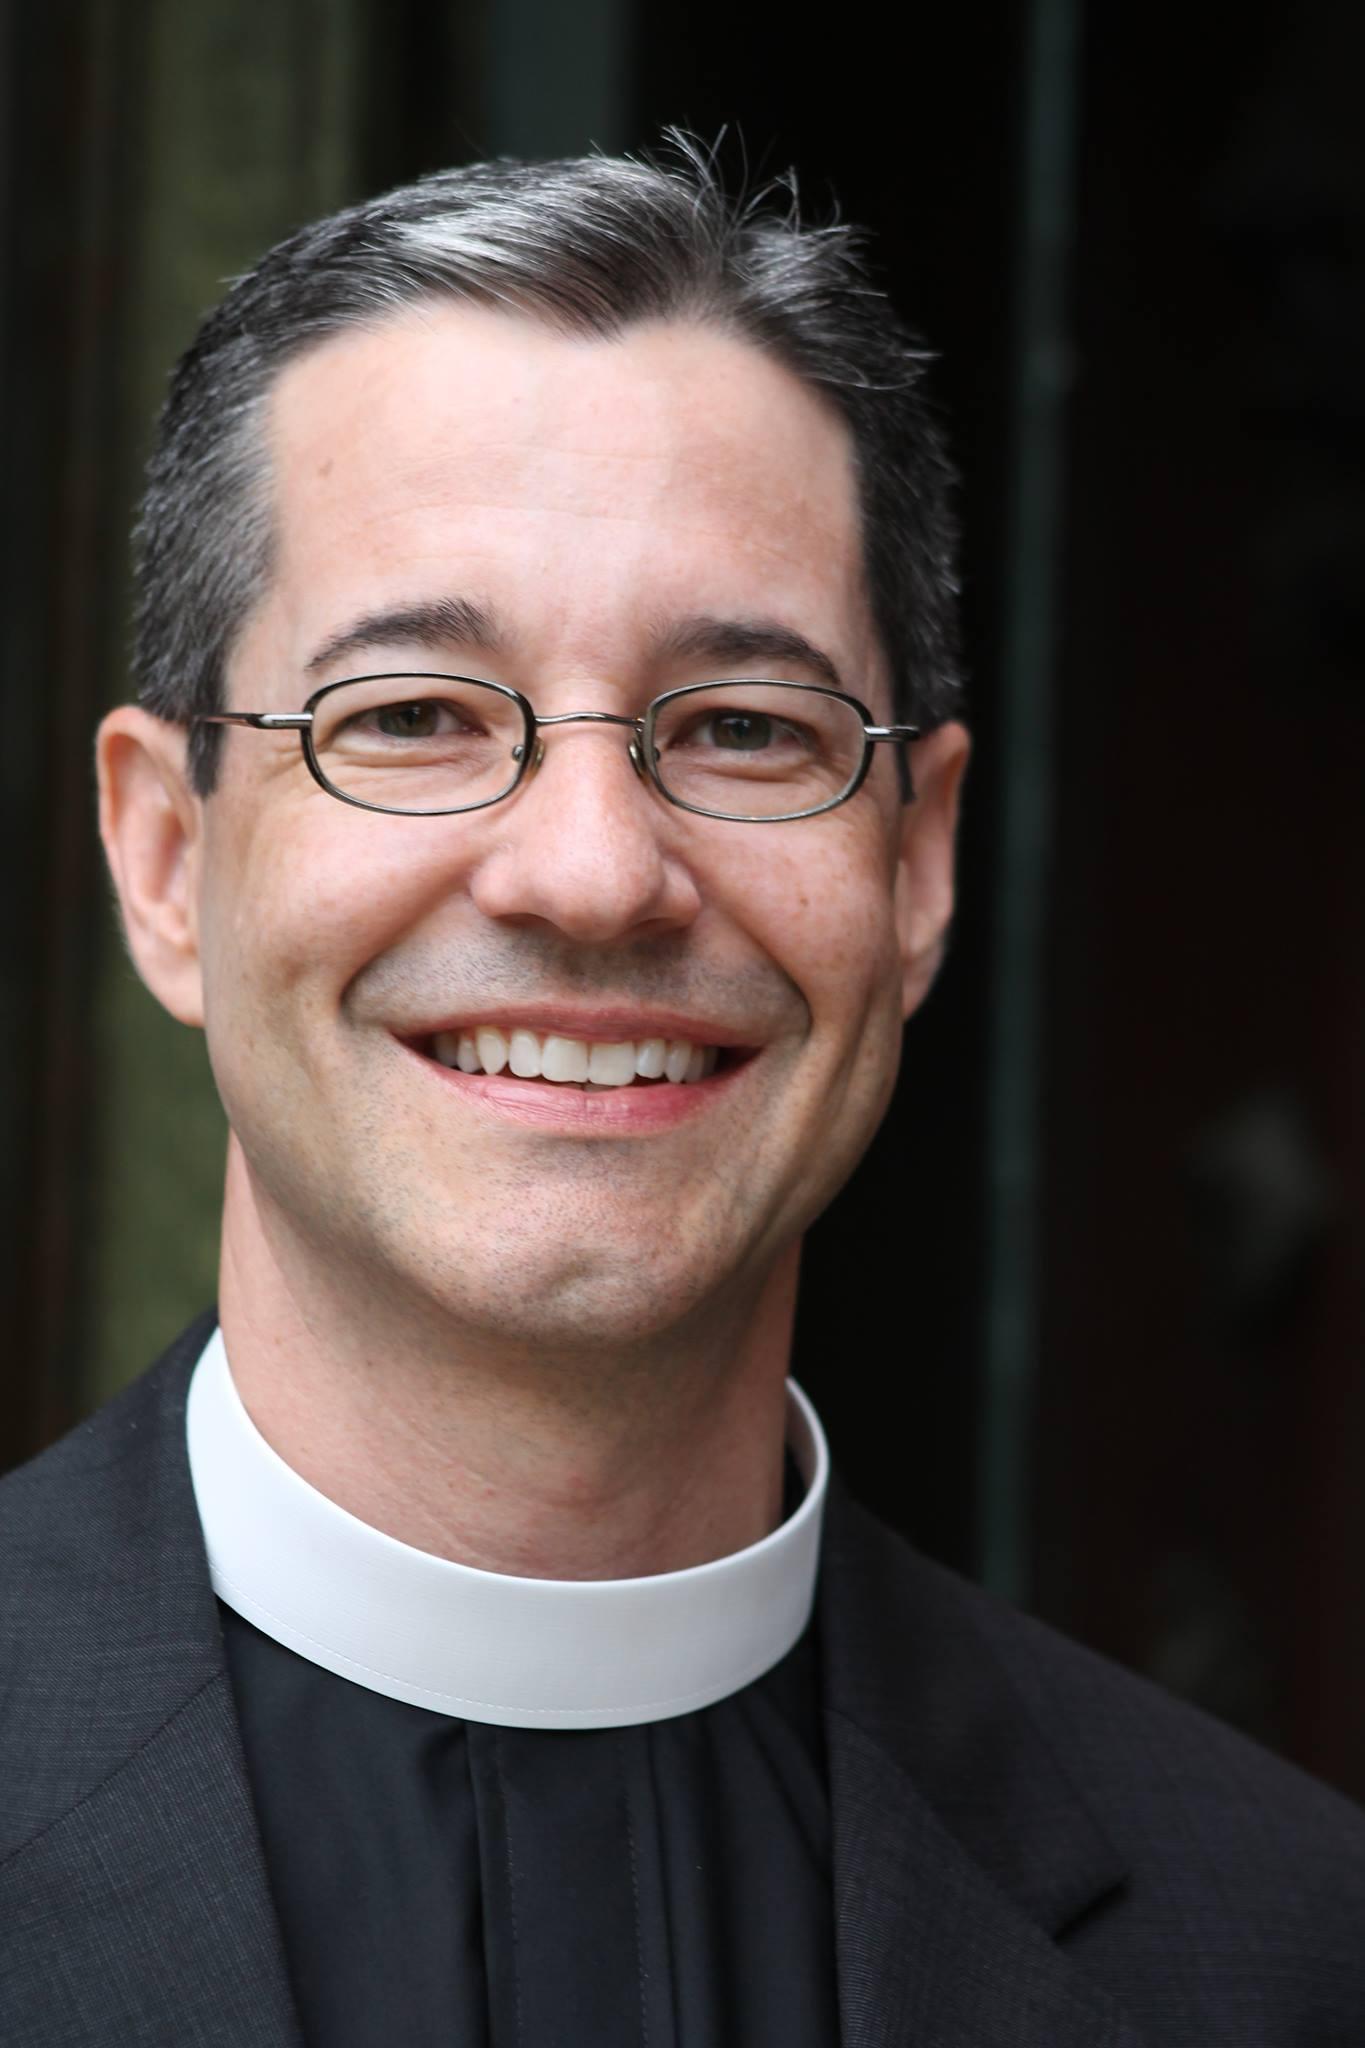 —Rev. Anthony Jones, Long Island NY, '20